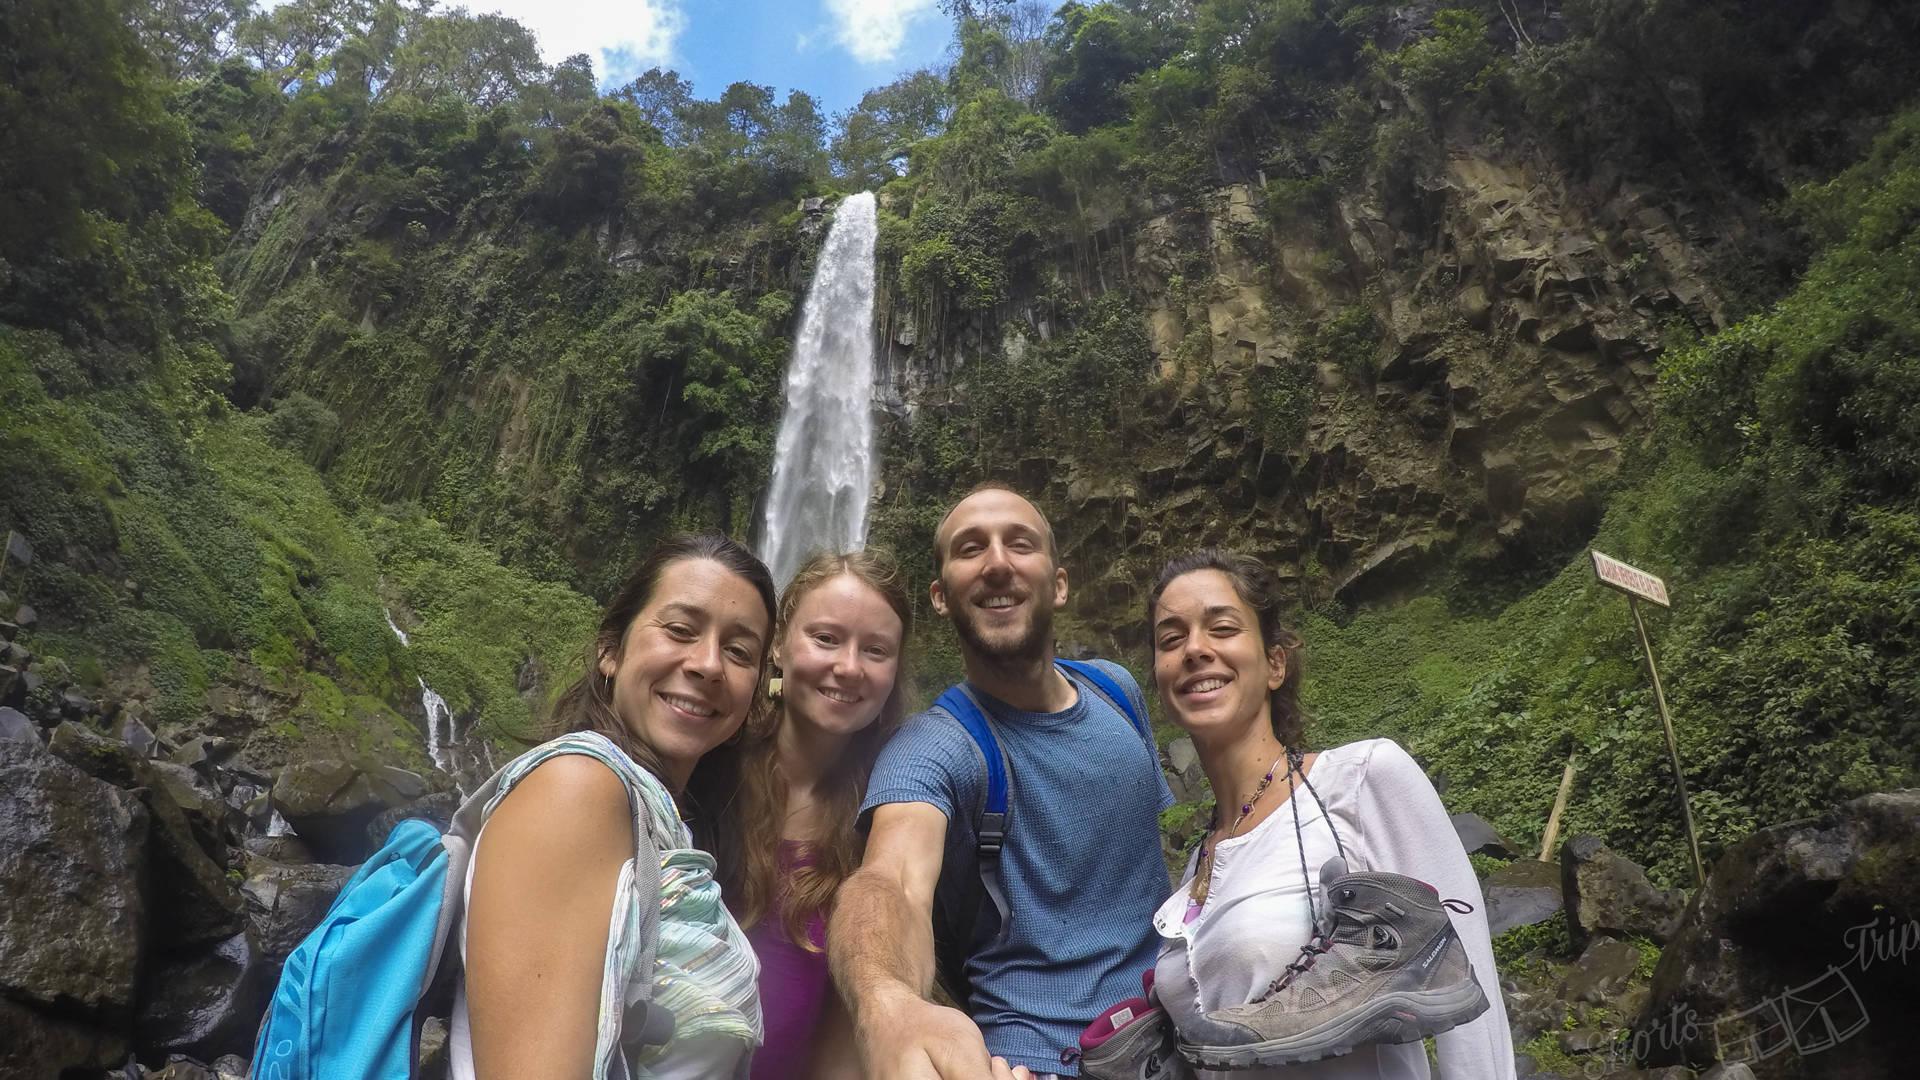 waterfall grojogan sewu, waterfall grojogan sewu indonesia, lawu waterfall, lawu hike, lawu climb, lawu climb on your own